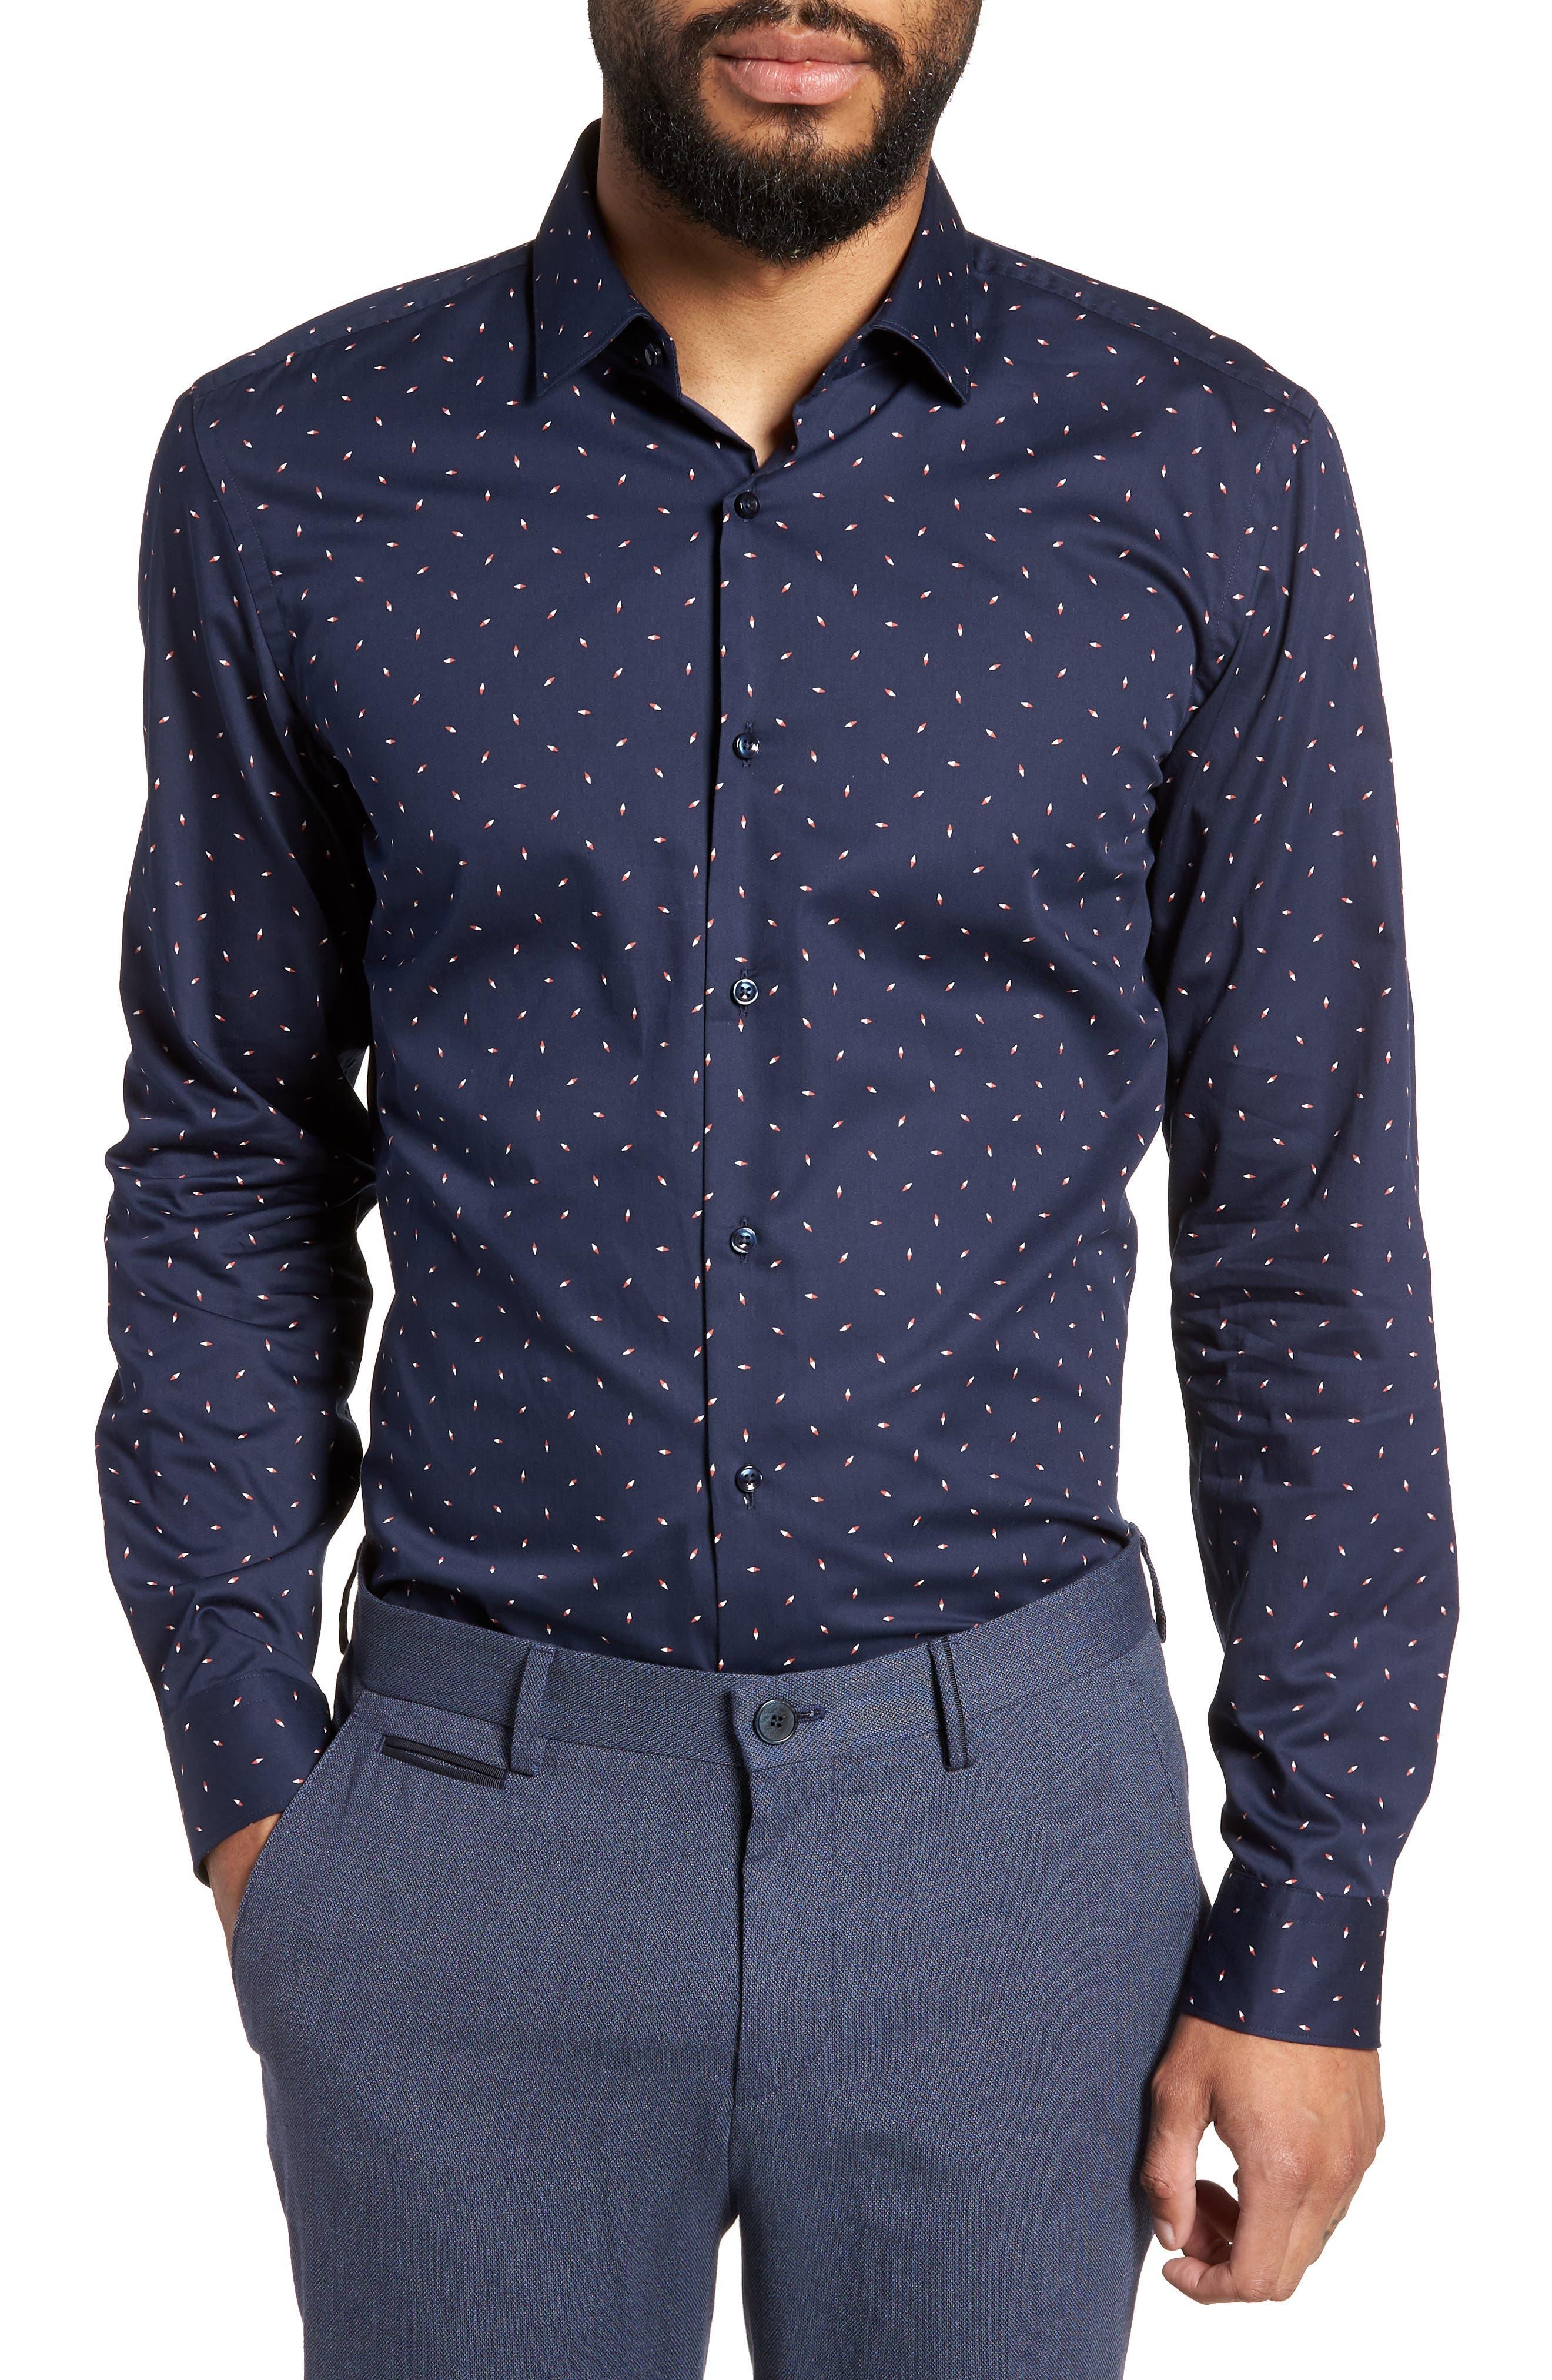 Ismo Slim Fit Print Dress Shirt,                             Main thumbnail 1, color,                             Navy